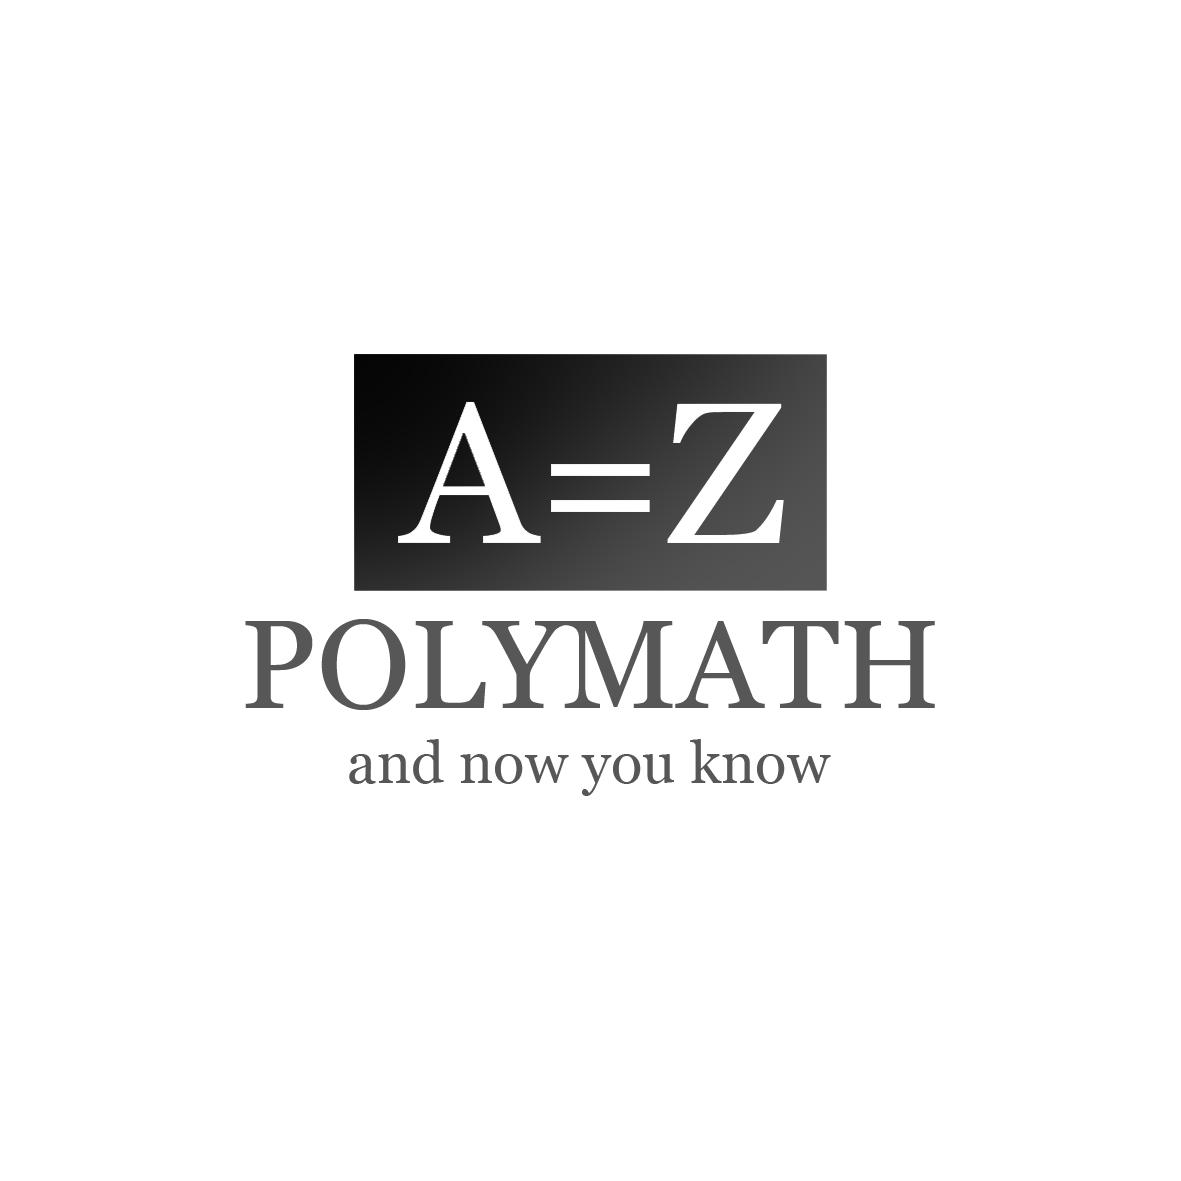 Logo Design by JaroslavProcka - Entry No. 66 in the Logo Design Contest Imaginative Logo Design for Polymath.